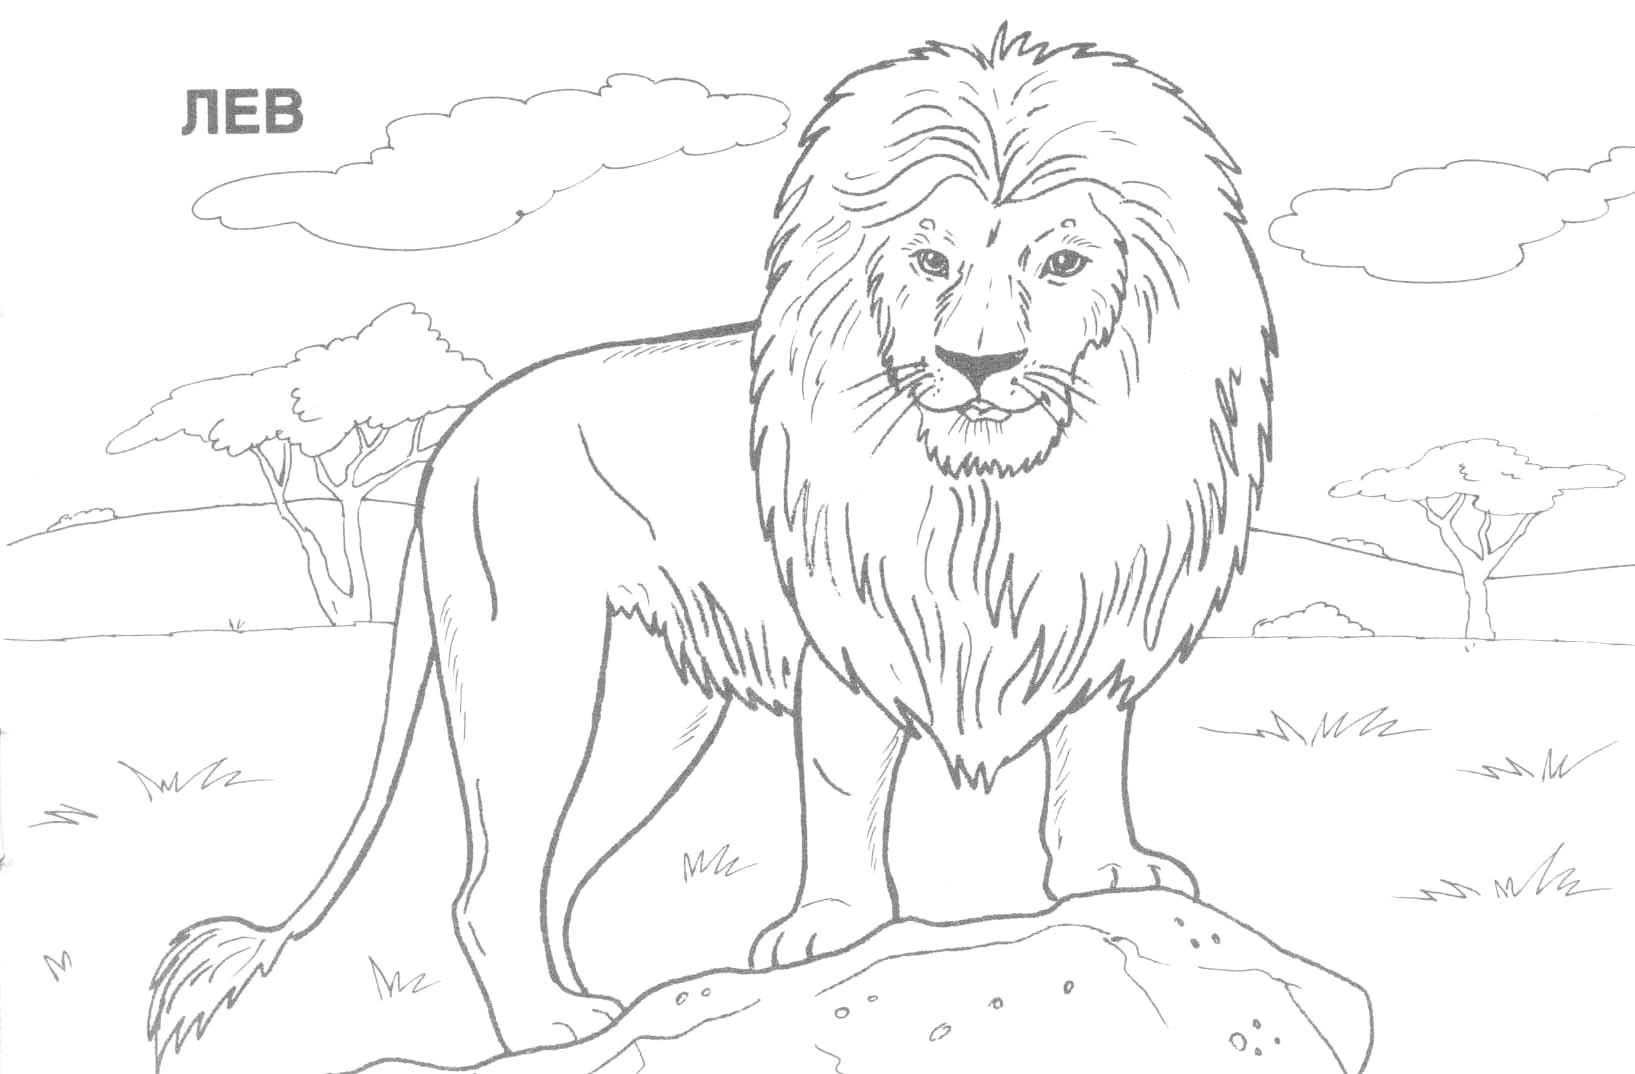 Pinjulia On Colorings | Blanco Y Negro, Dibujos A Lápiz - Free Printable Wild Animal Coloring Pages